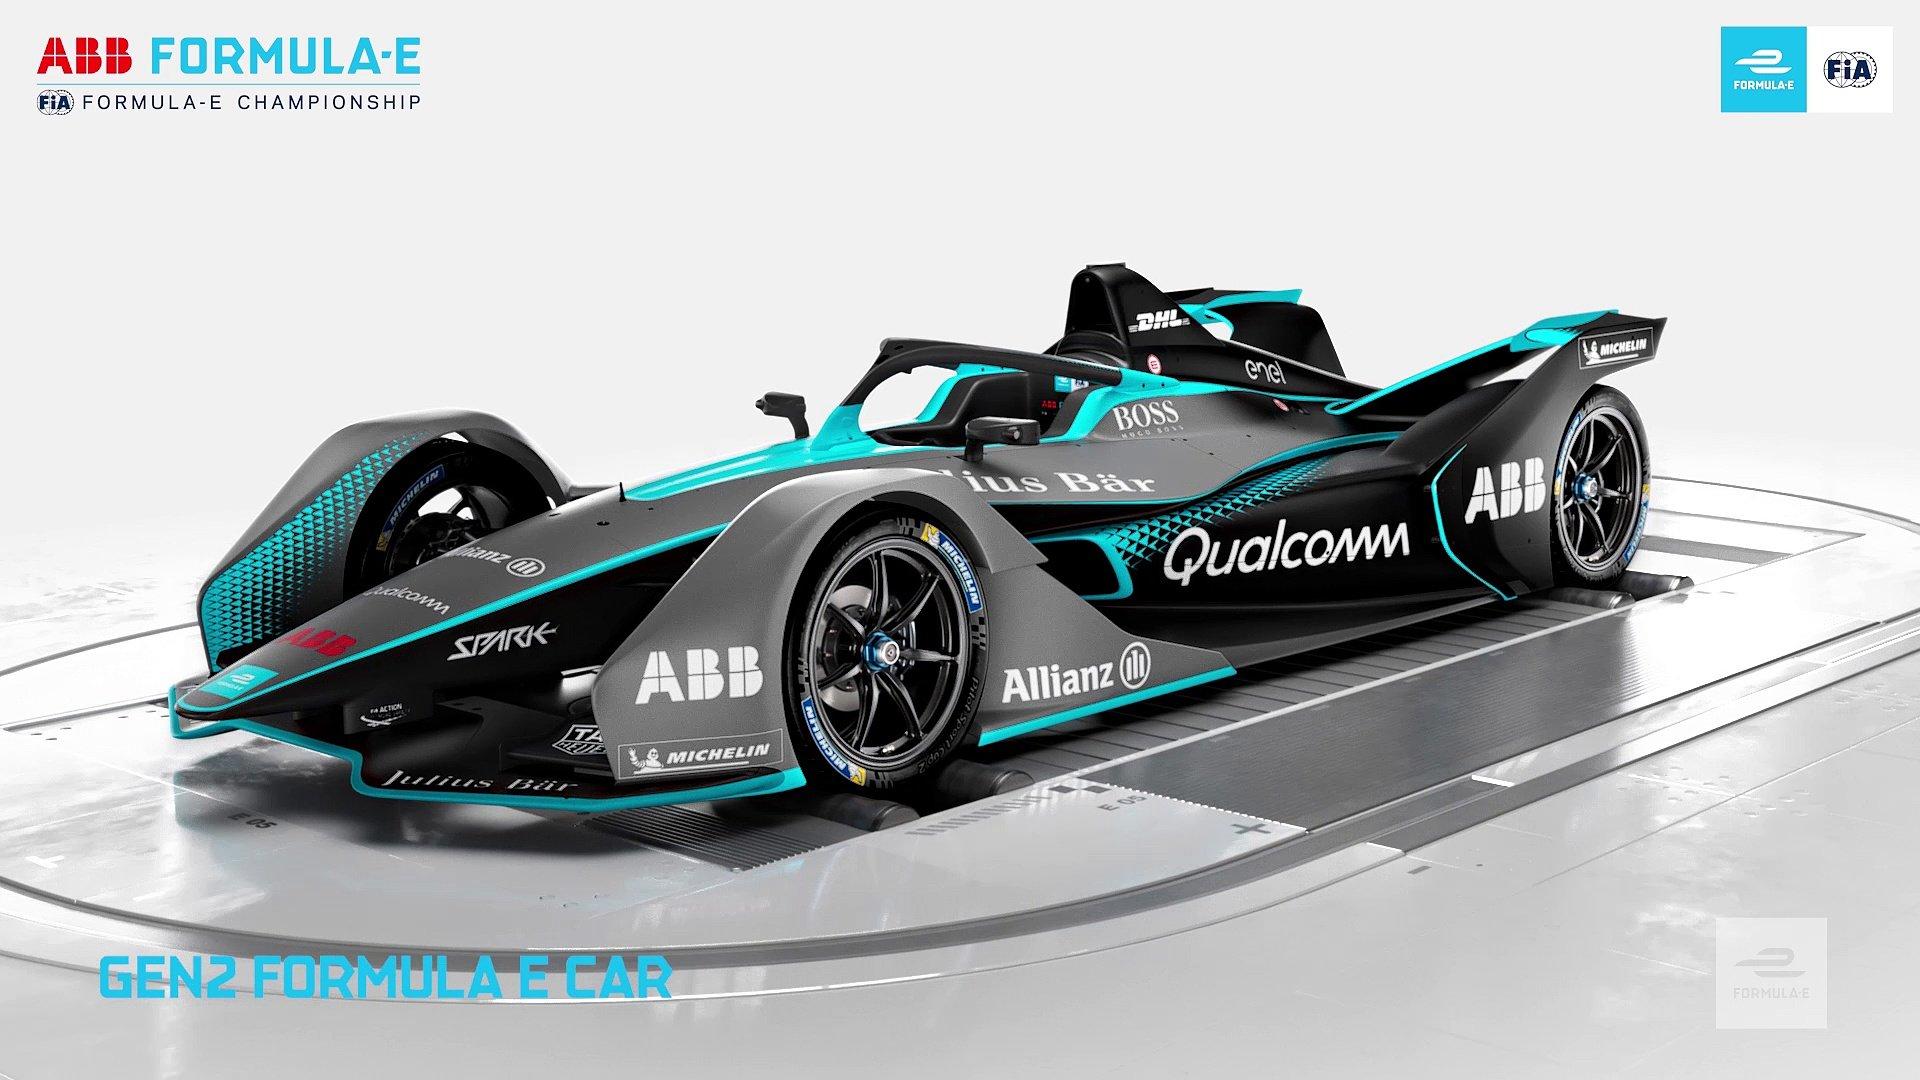 La formula E superará a la Fórmula 1 en 10 años